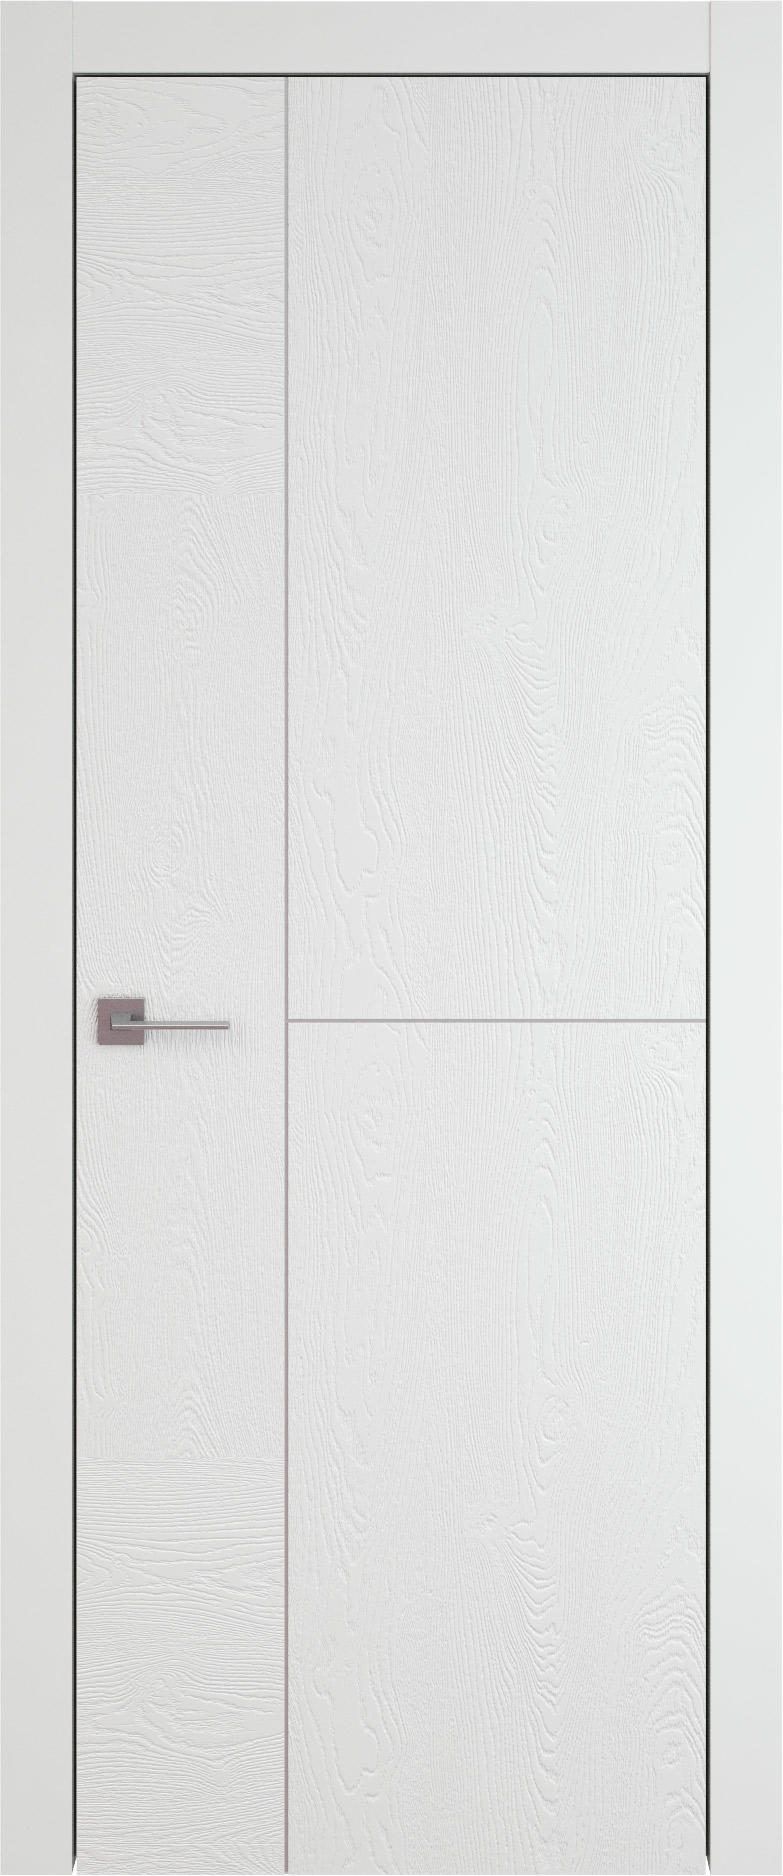 Tivoli Г-1 цвет - Белая эмаль по шпону (RAL 9003) Без стекла (ДГ)